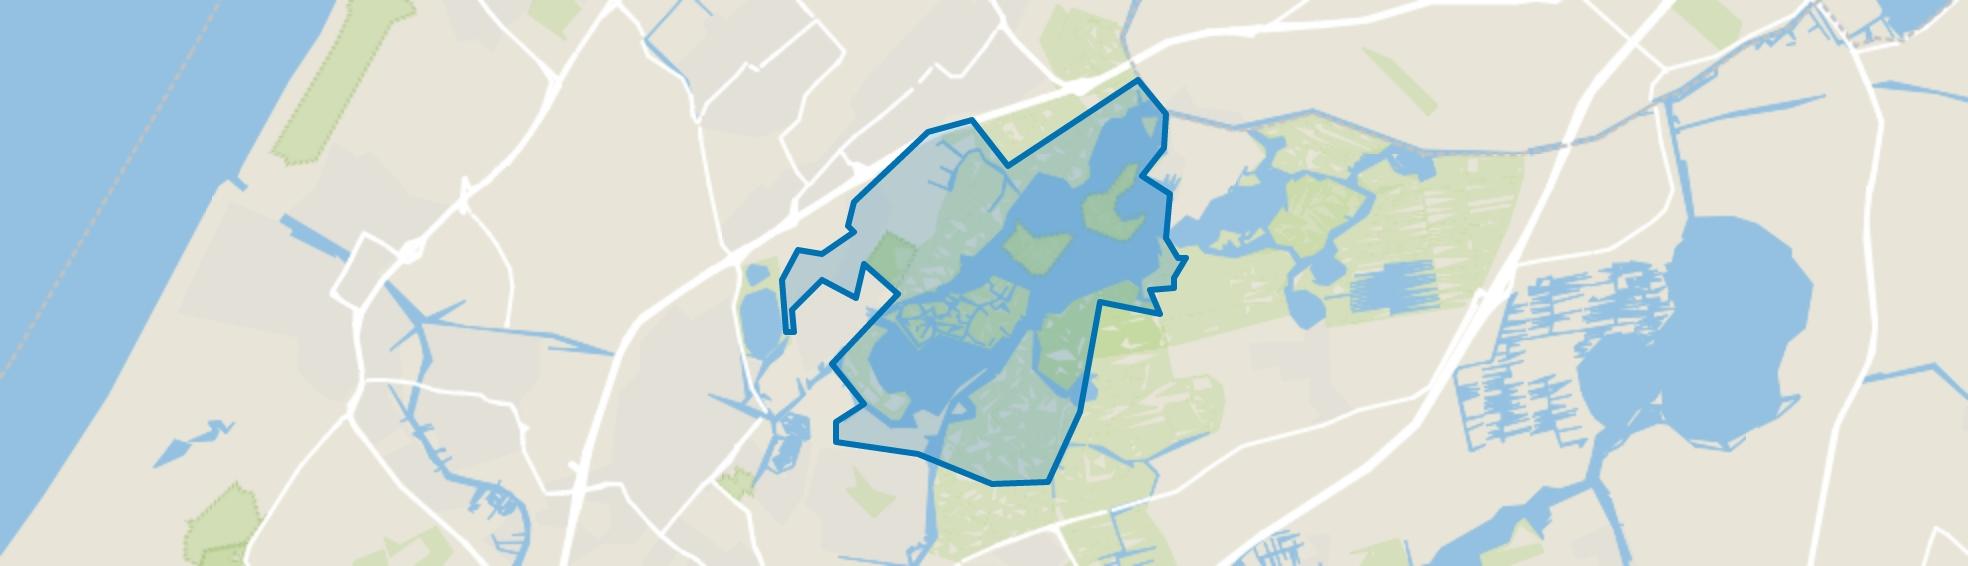 Warmond buitengebied-Oosteinde, Warmond map